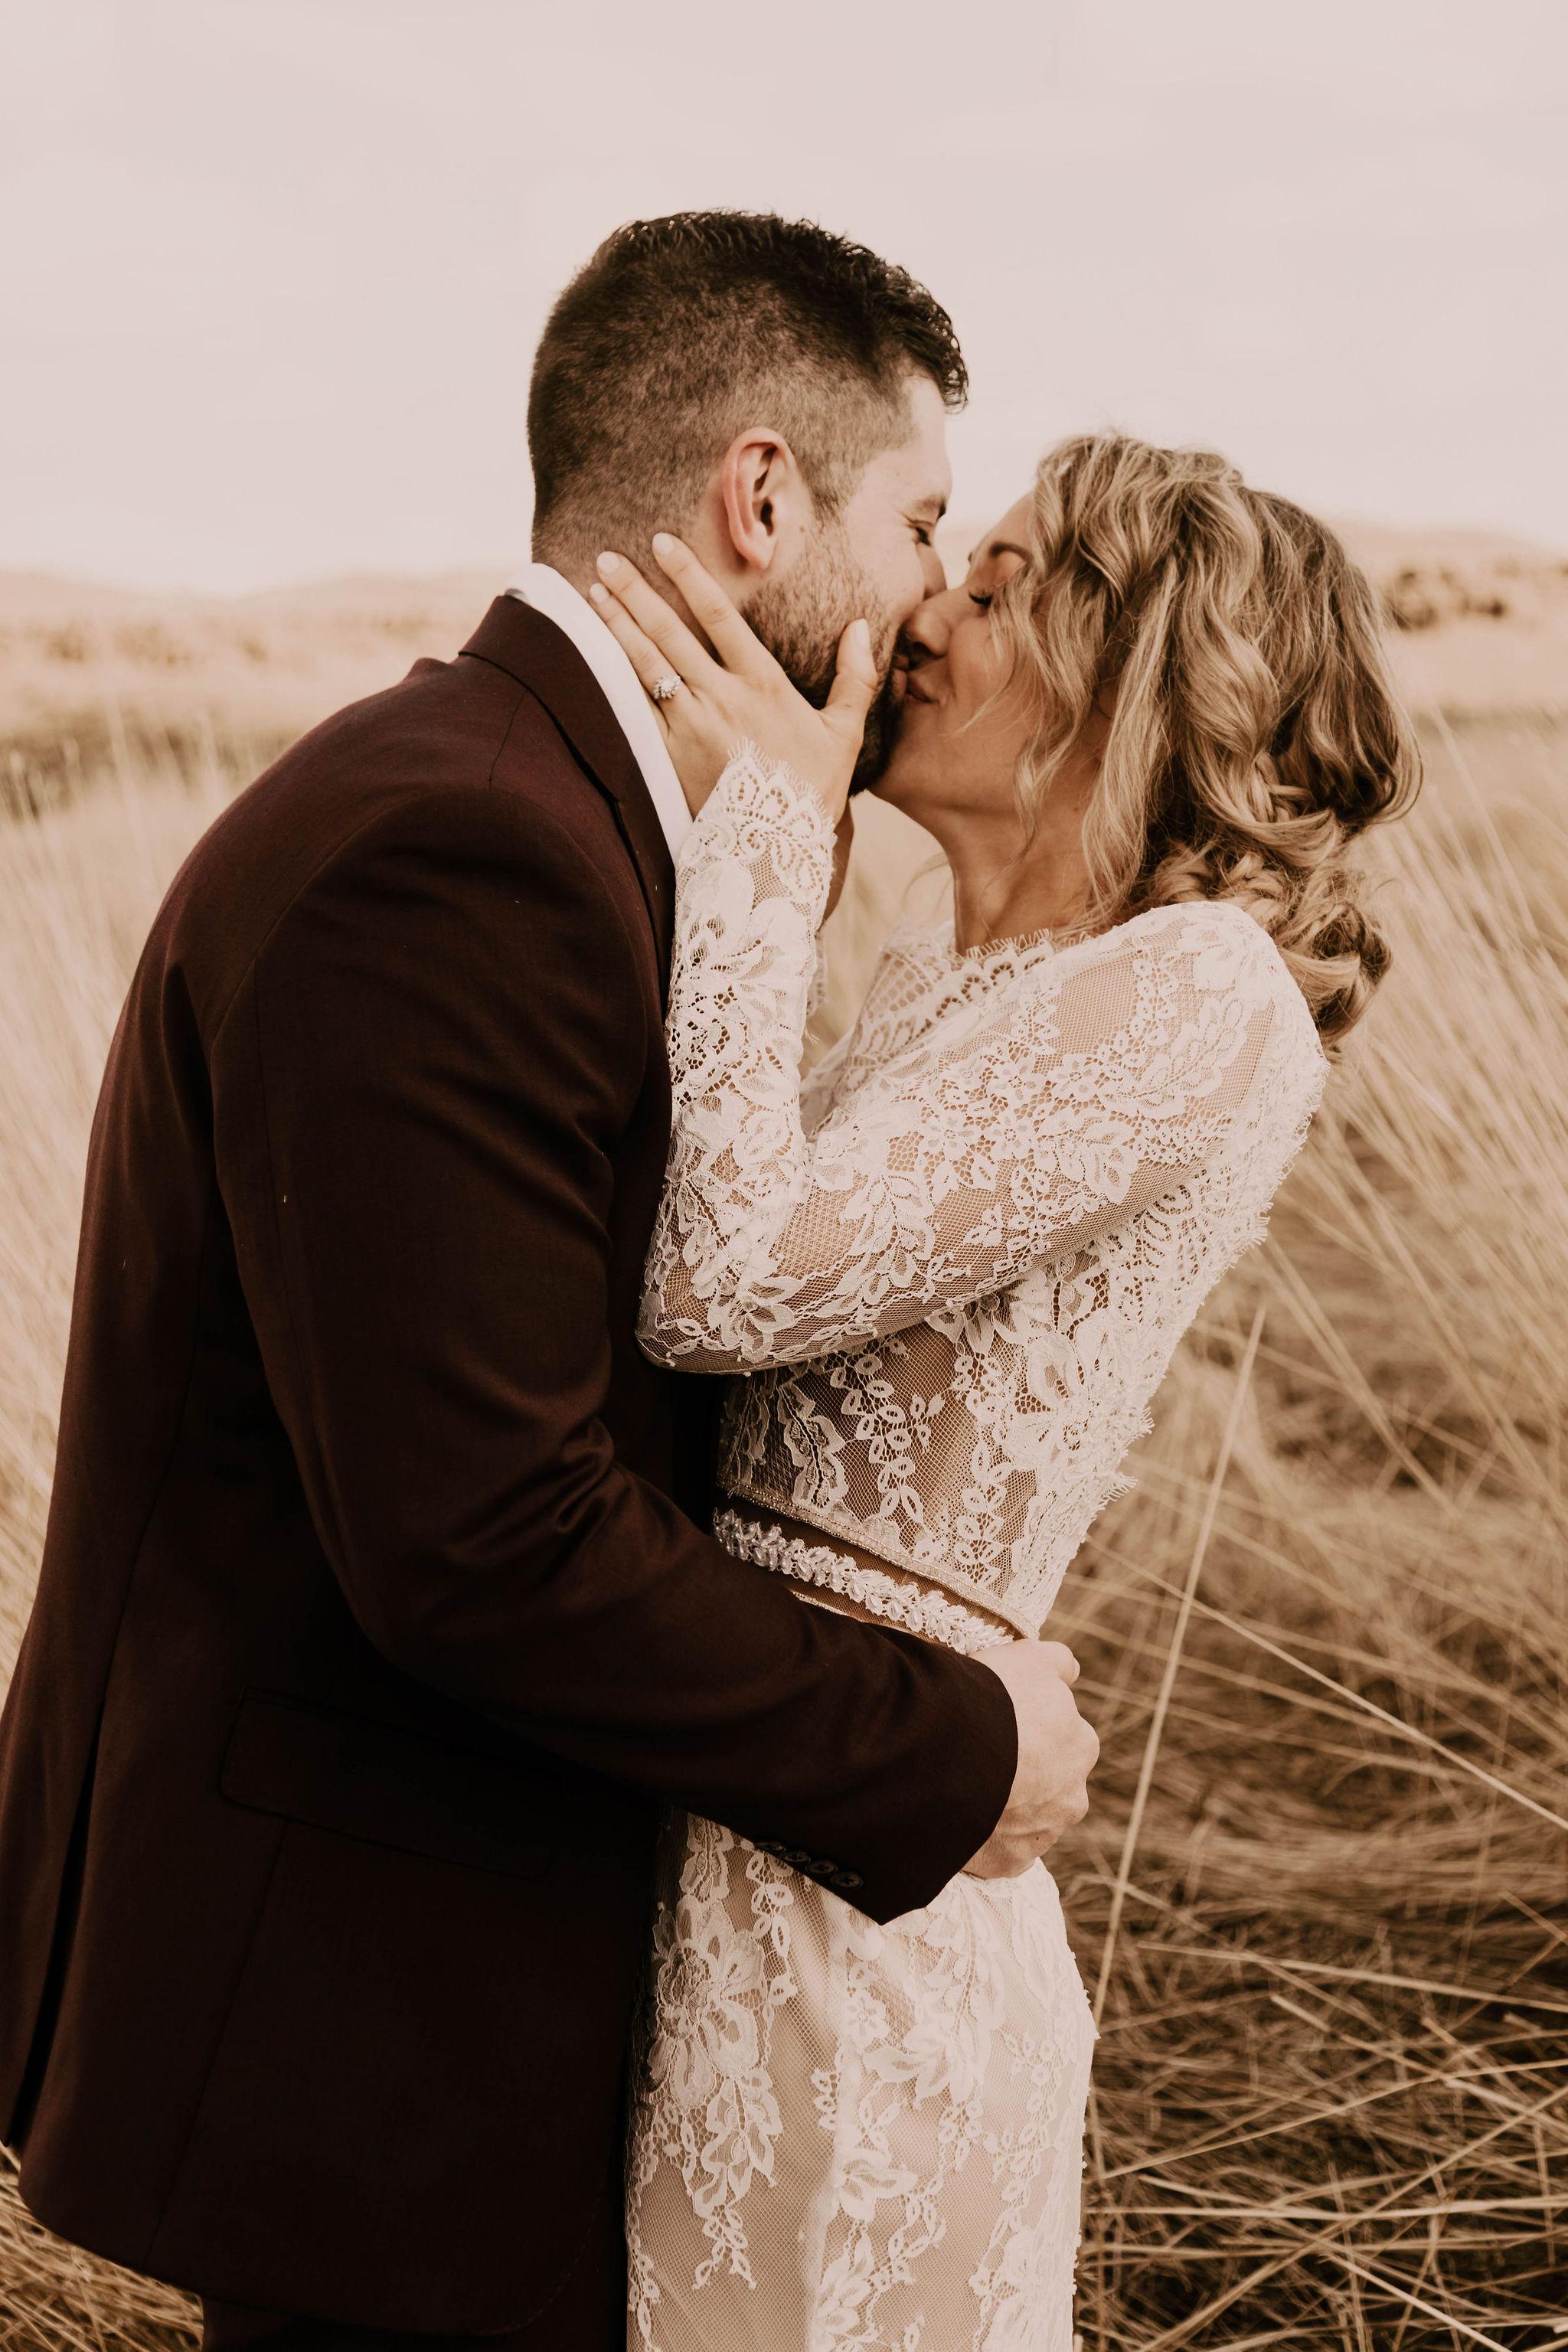 spokane elopement desert summer bride wedding